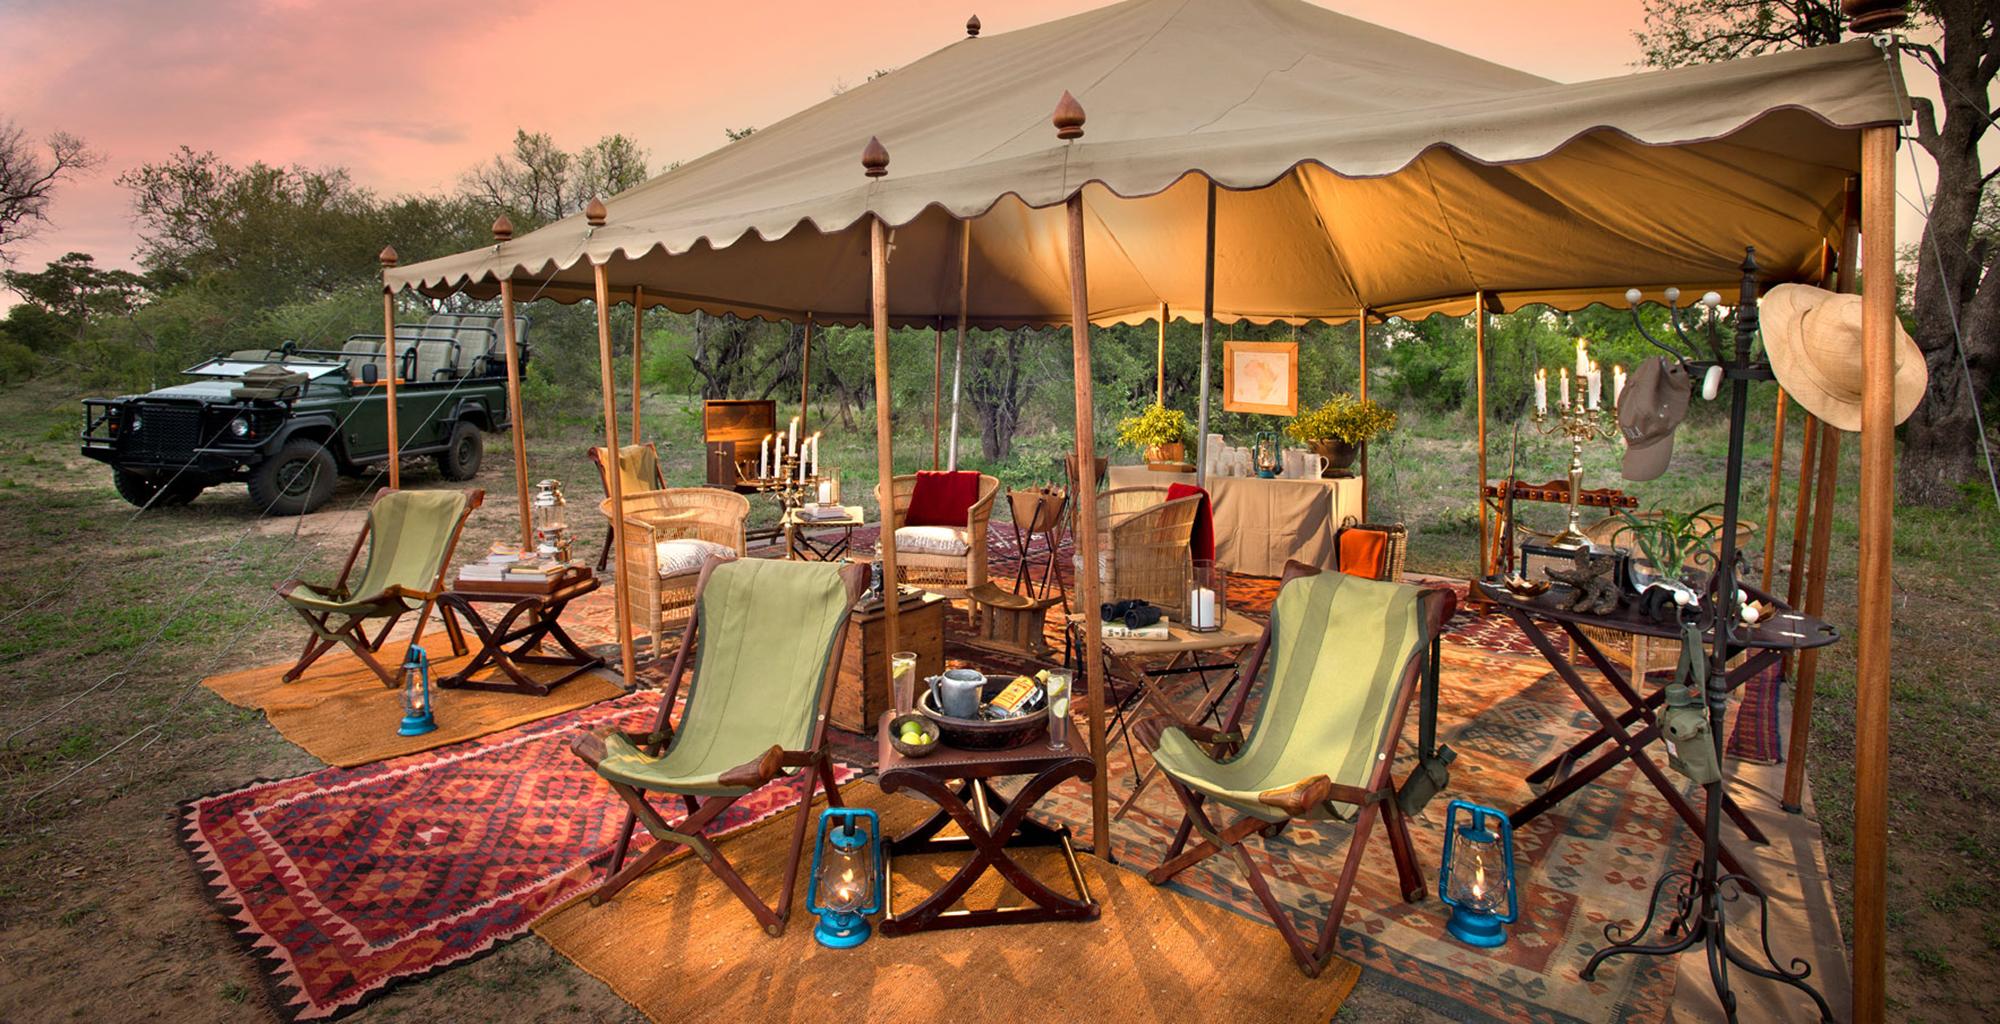 South-Africa-Tanda-Tula-Field-Camp-Lounge-Area